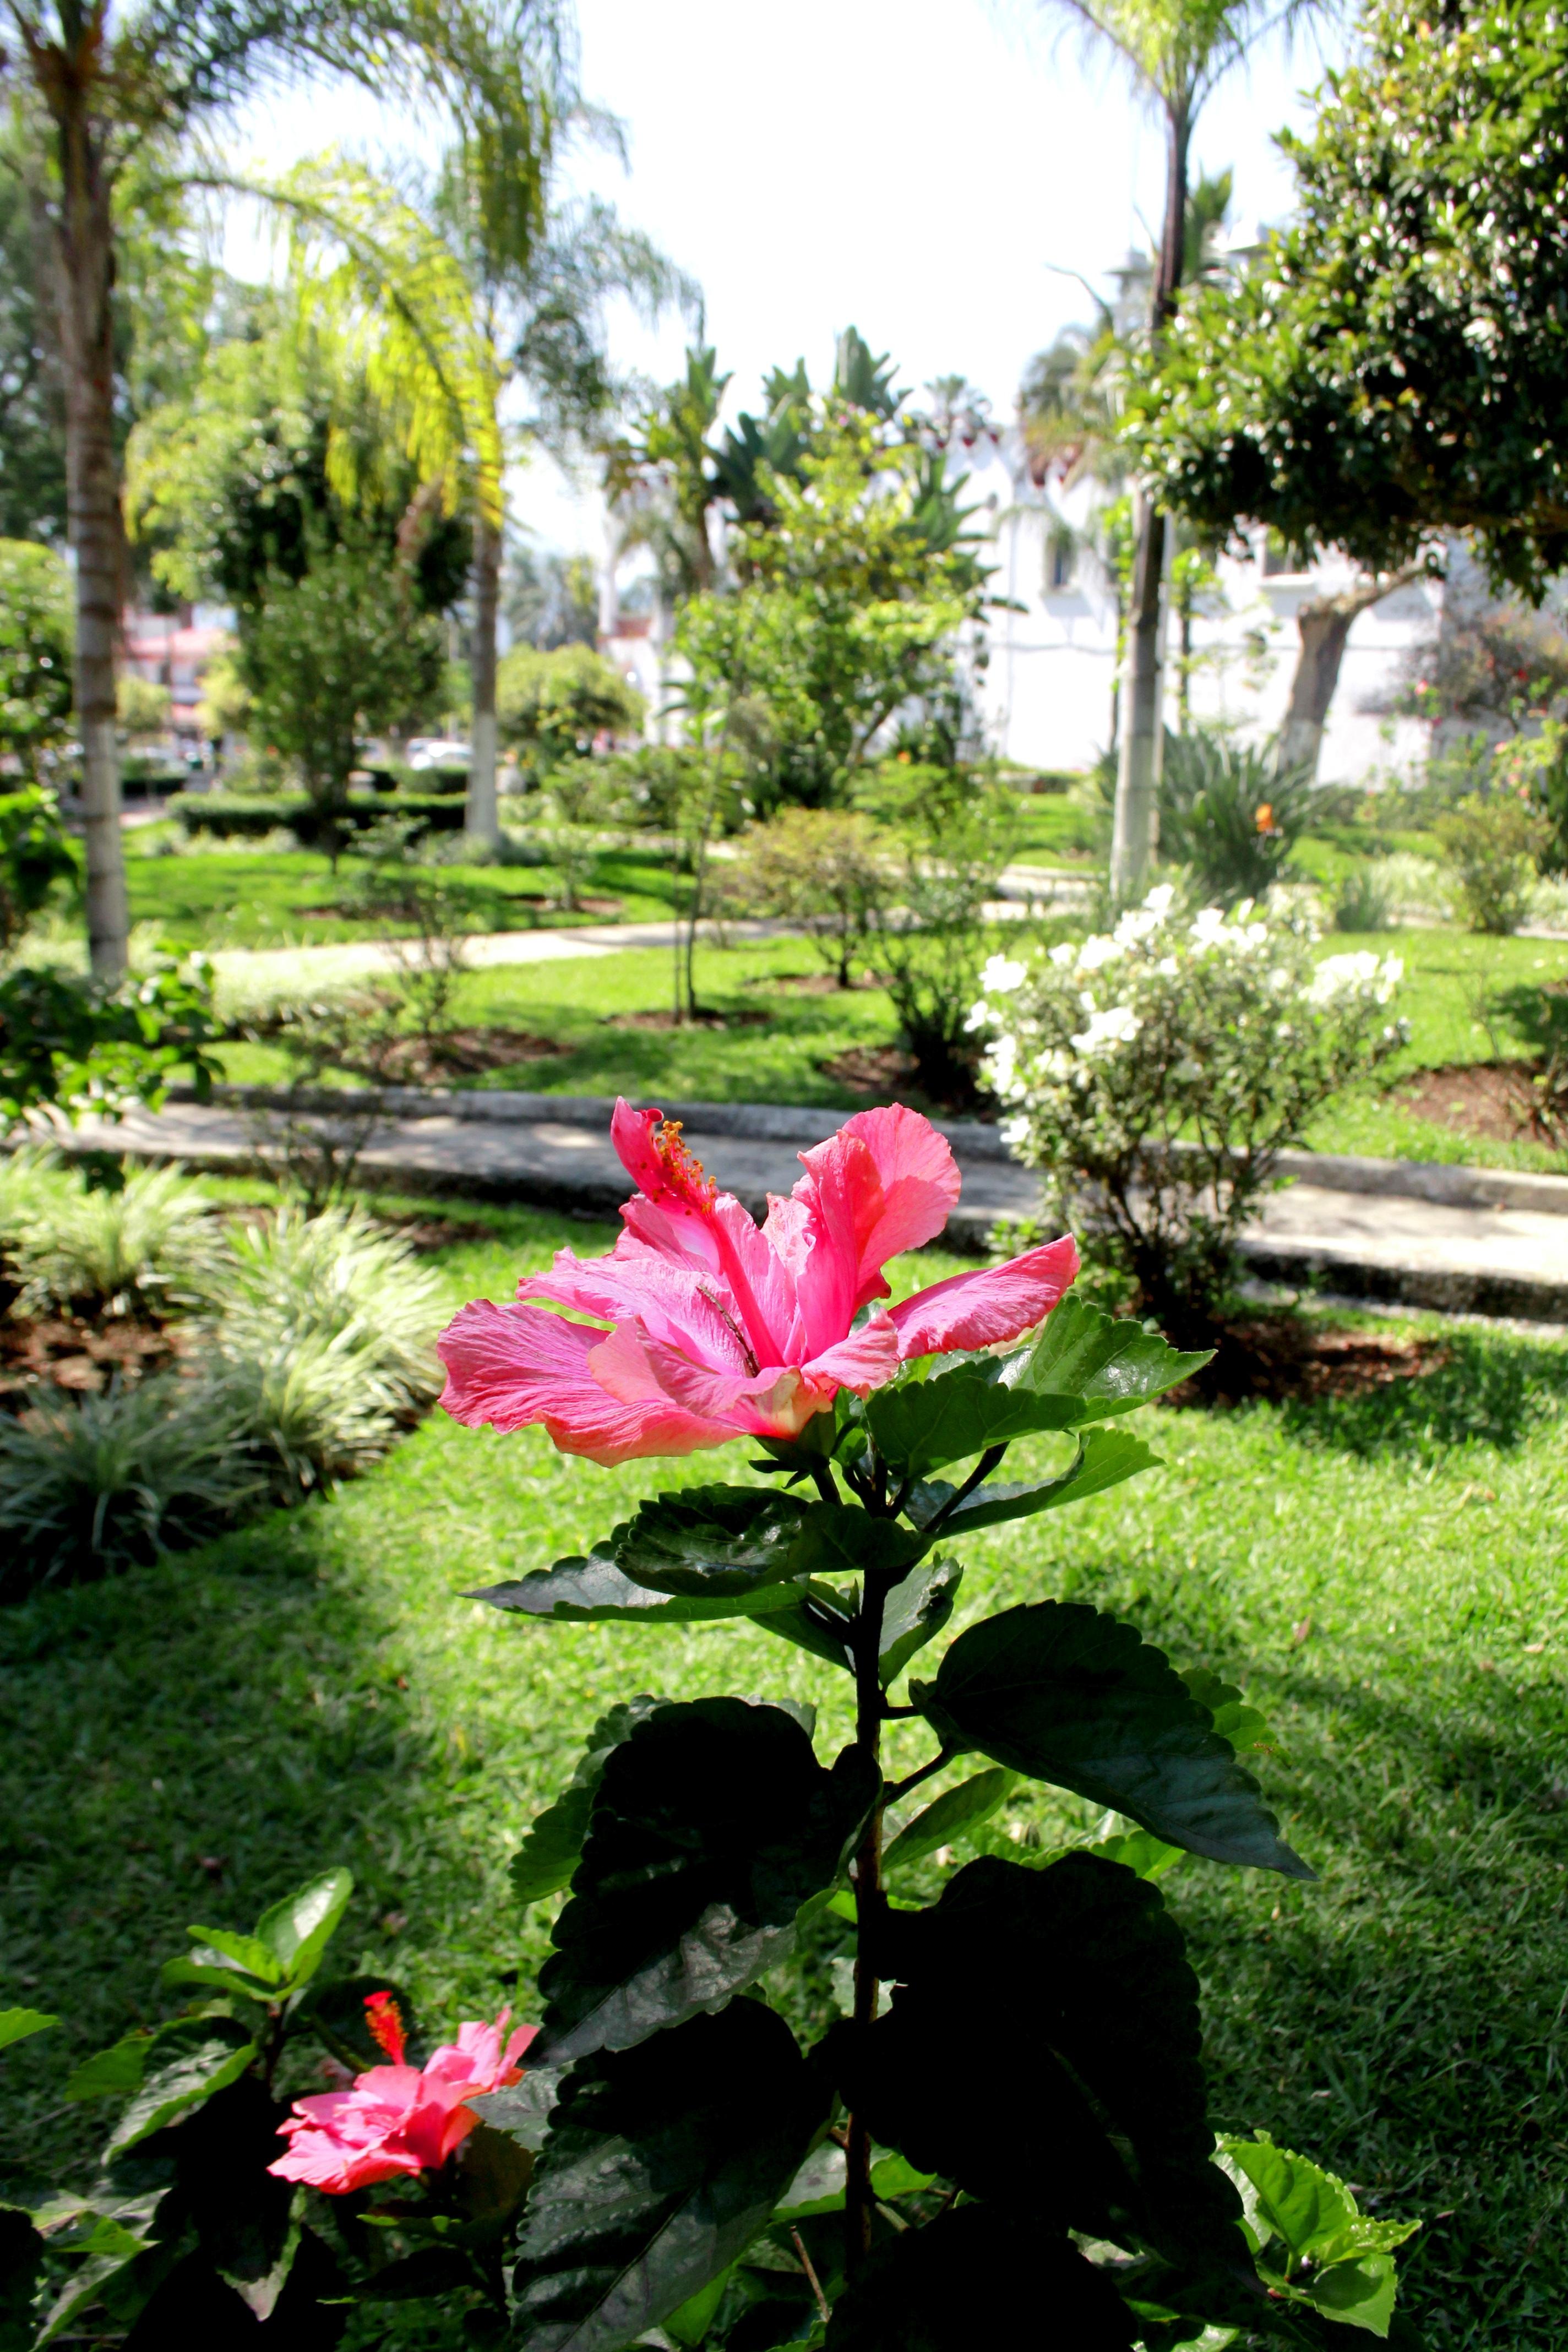 Free Images Nature Lawn Flower Spring Park Backyard Botany